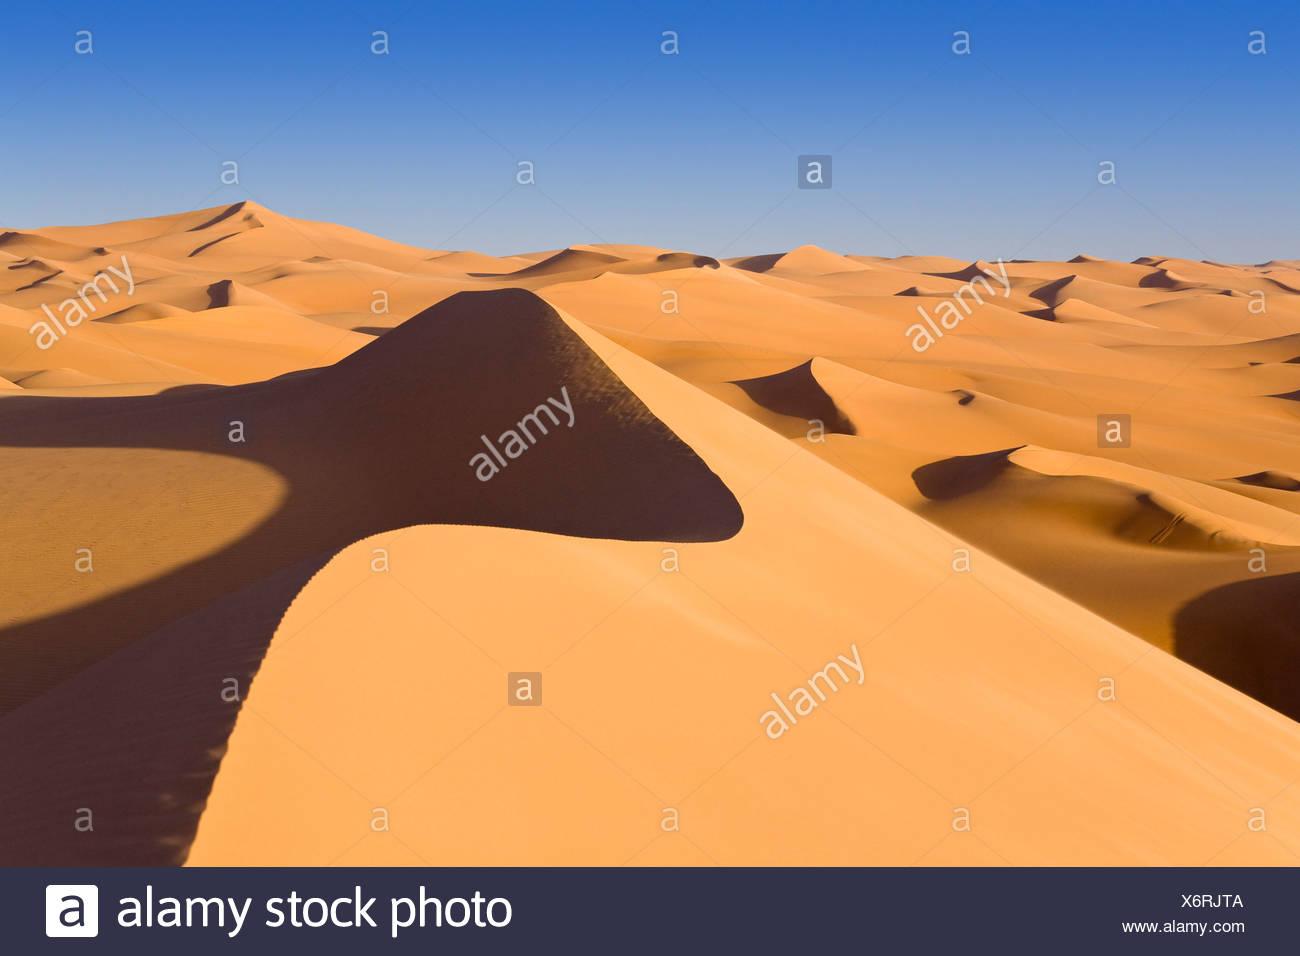 Sanddünen in der libyschen Wüste, Sahara, Libyen, Nordafrika, Afrika Stockbild